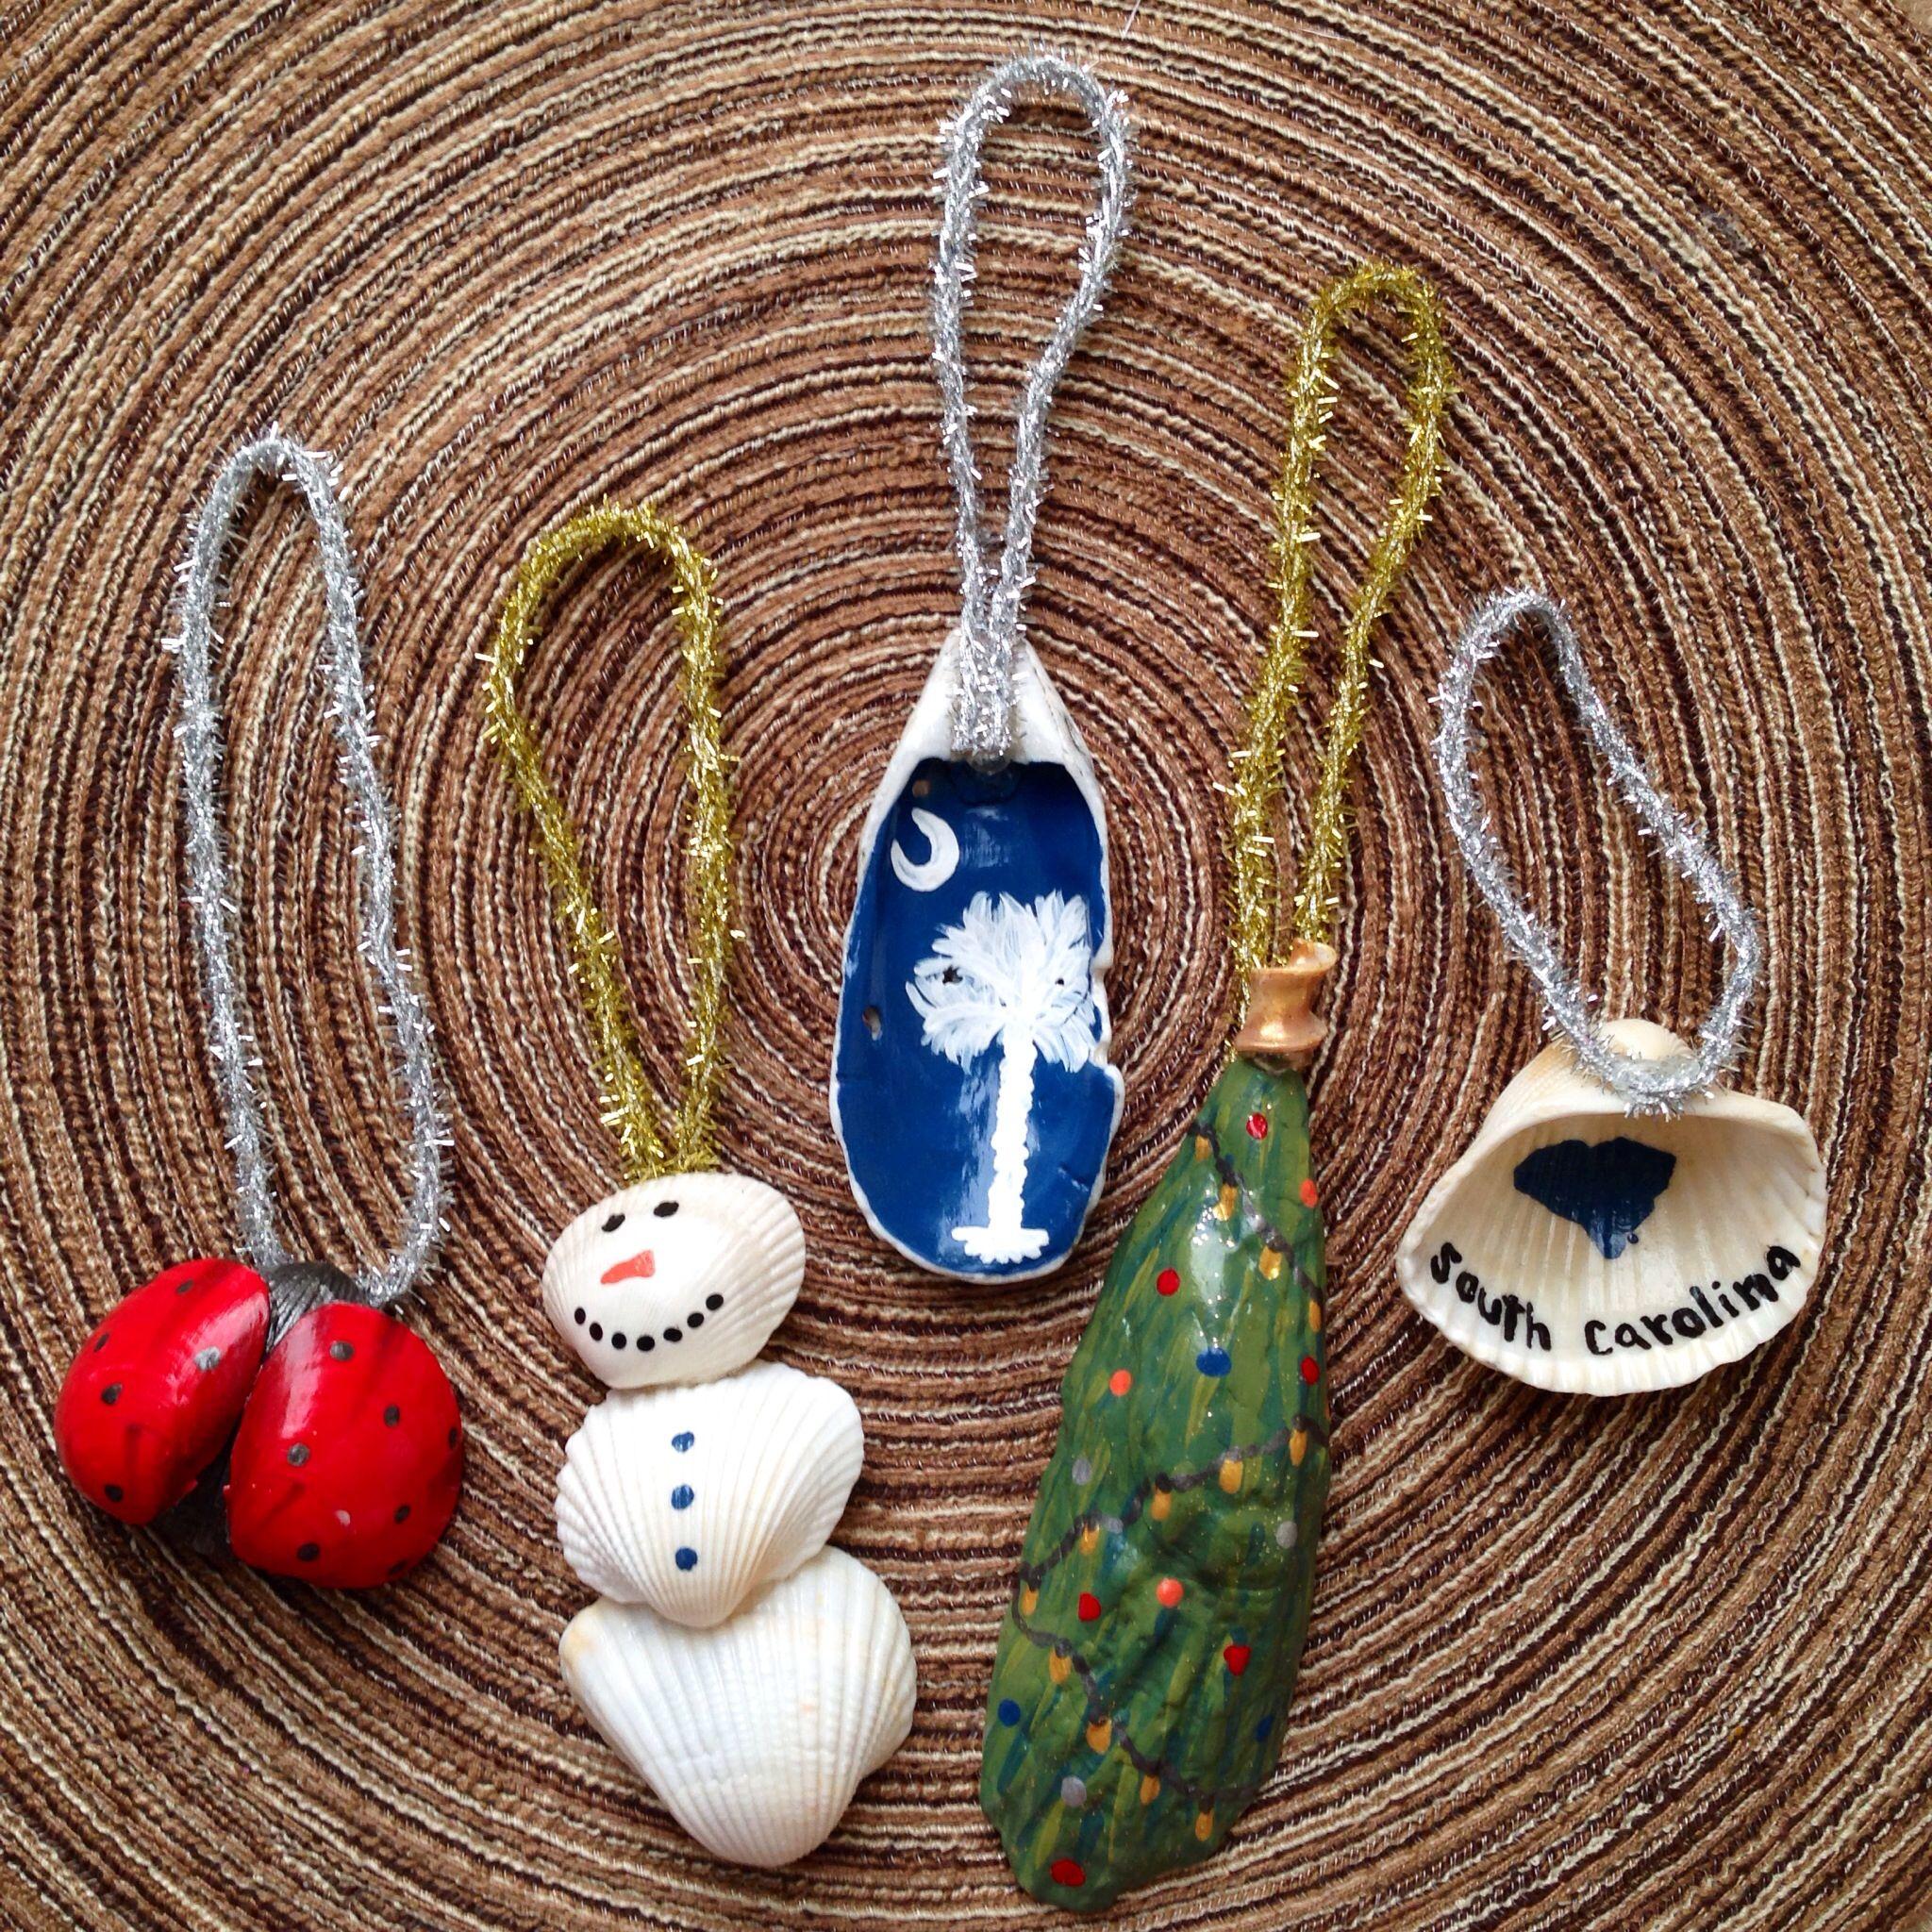 Seashell christmas ornaments craft ideas pinterest for Seashell ornament ideas